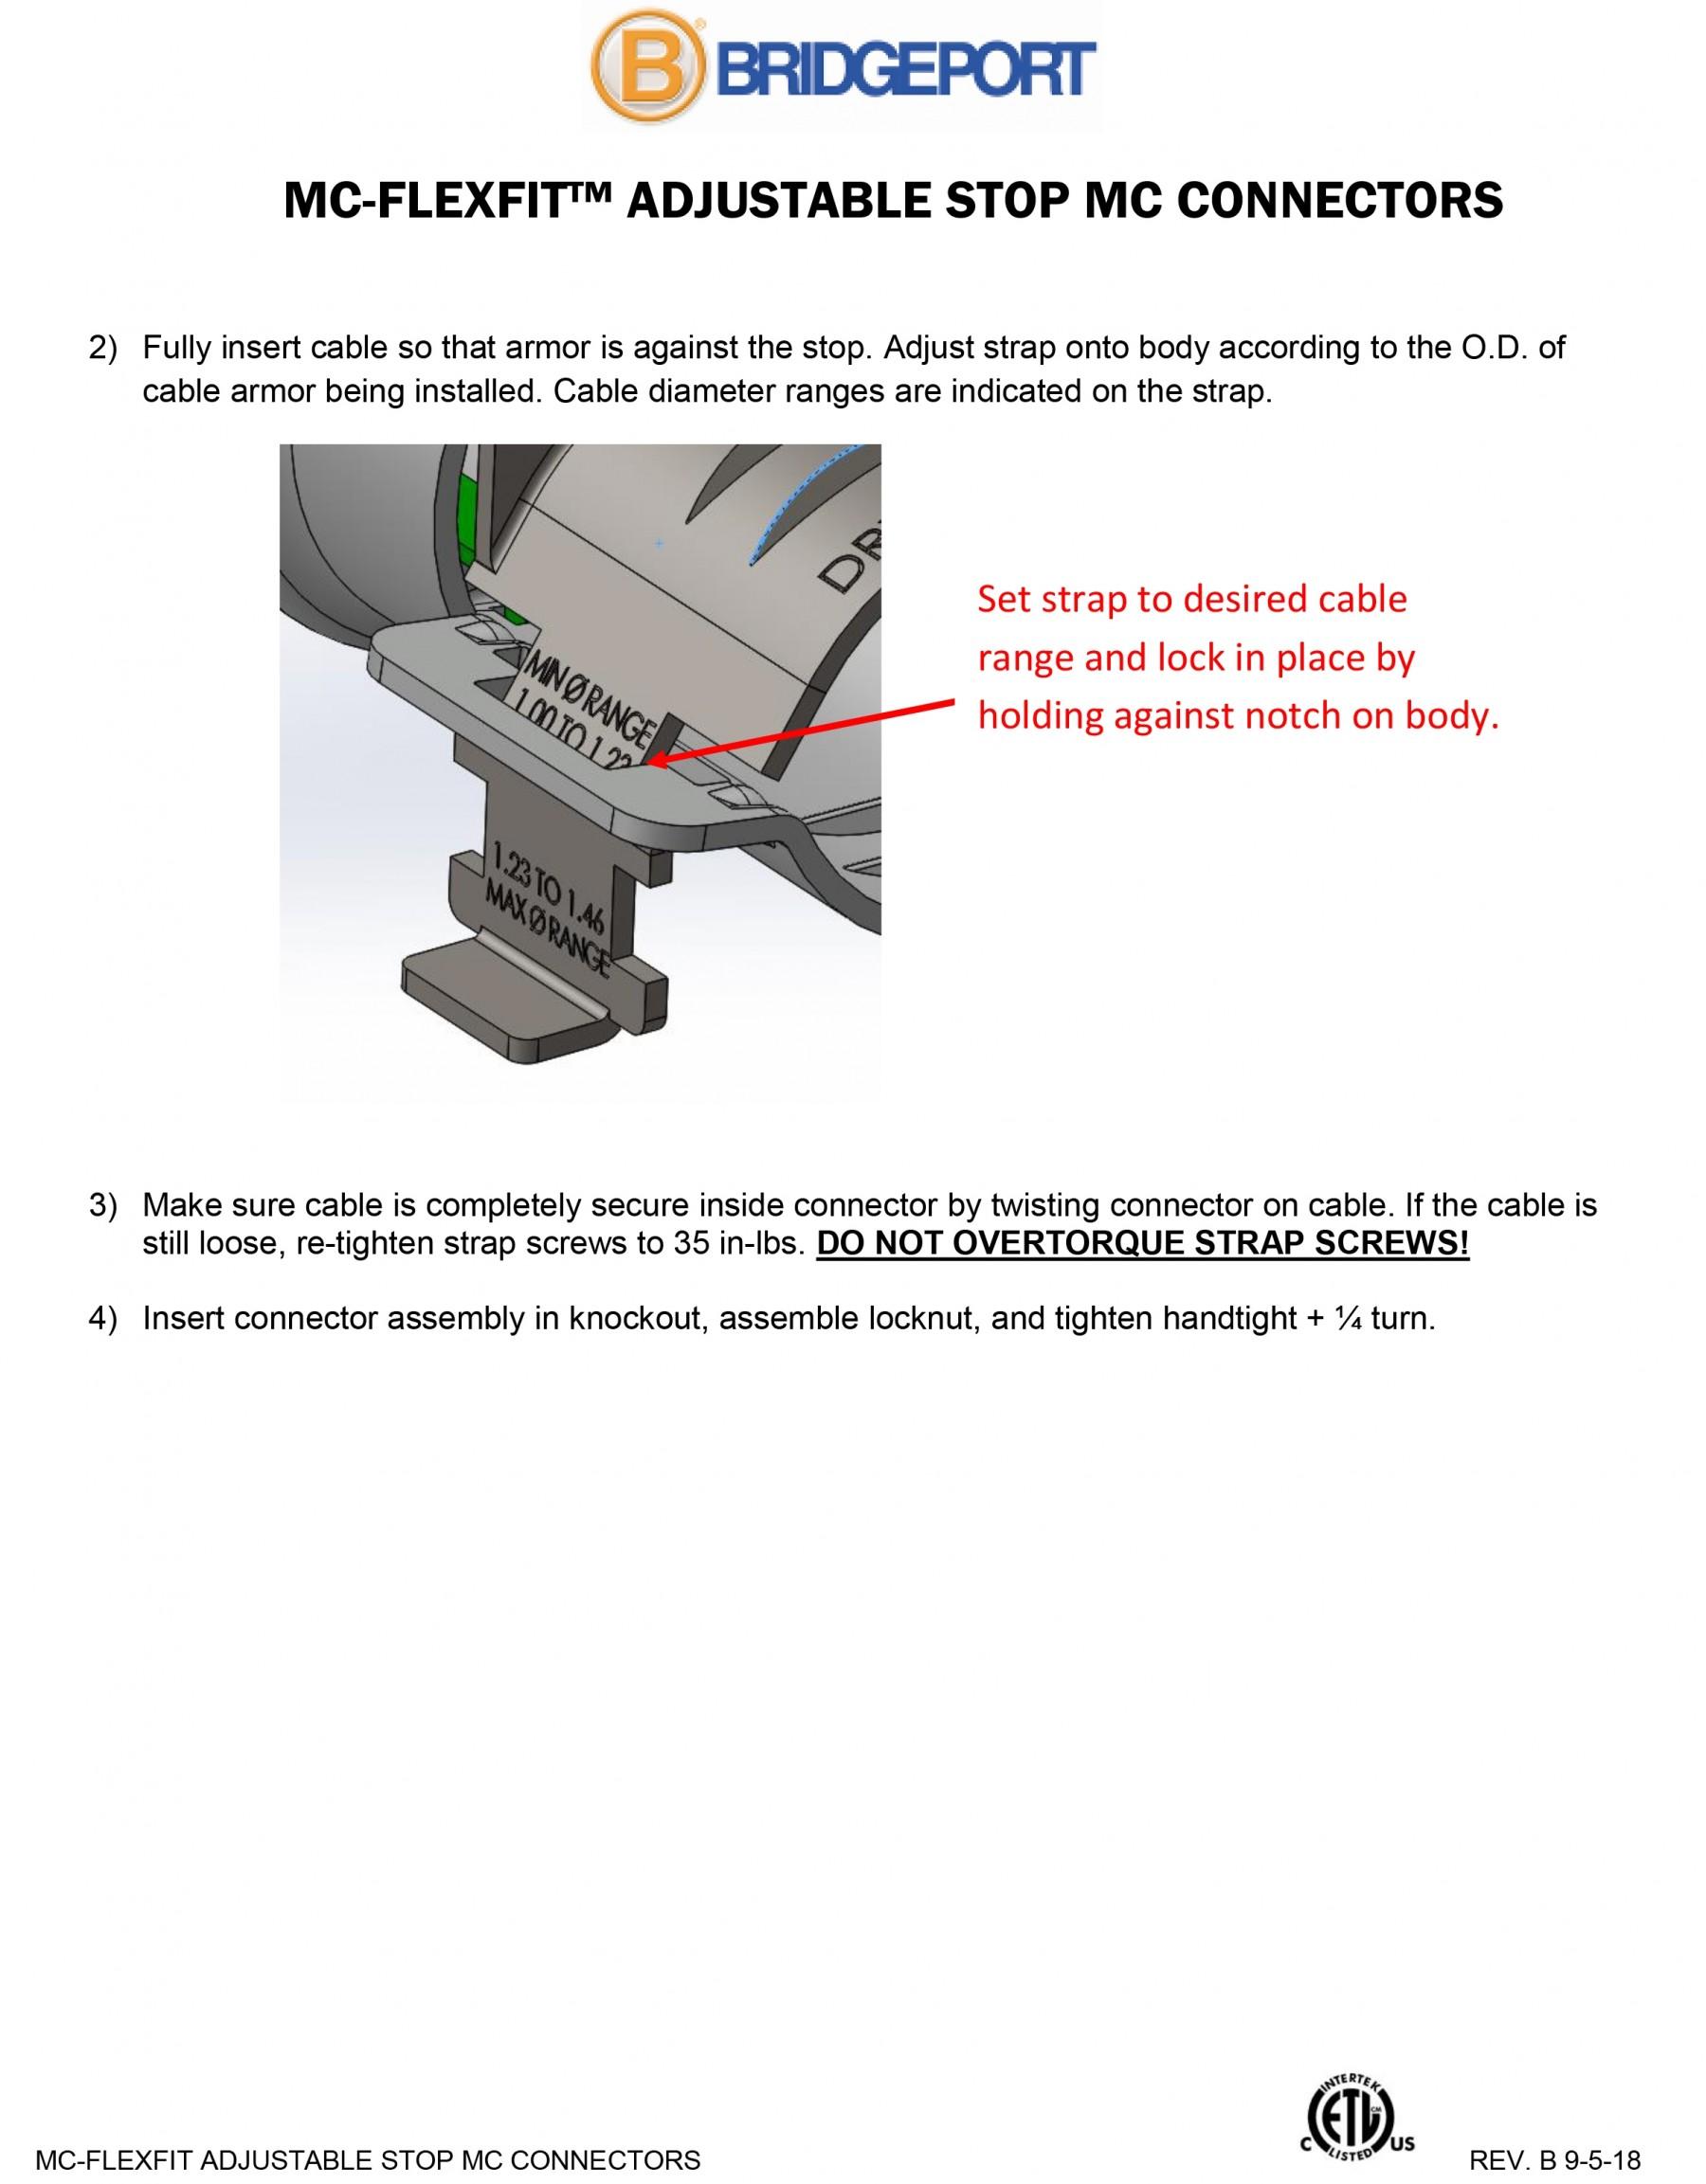 Connector, Adjustable Endstop, MC Feeder Cable, Two Screw, Steel, 1-1/2 Inch-6